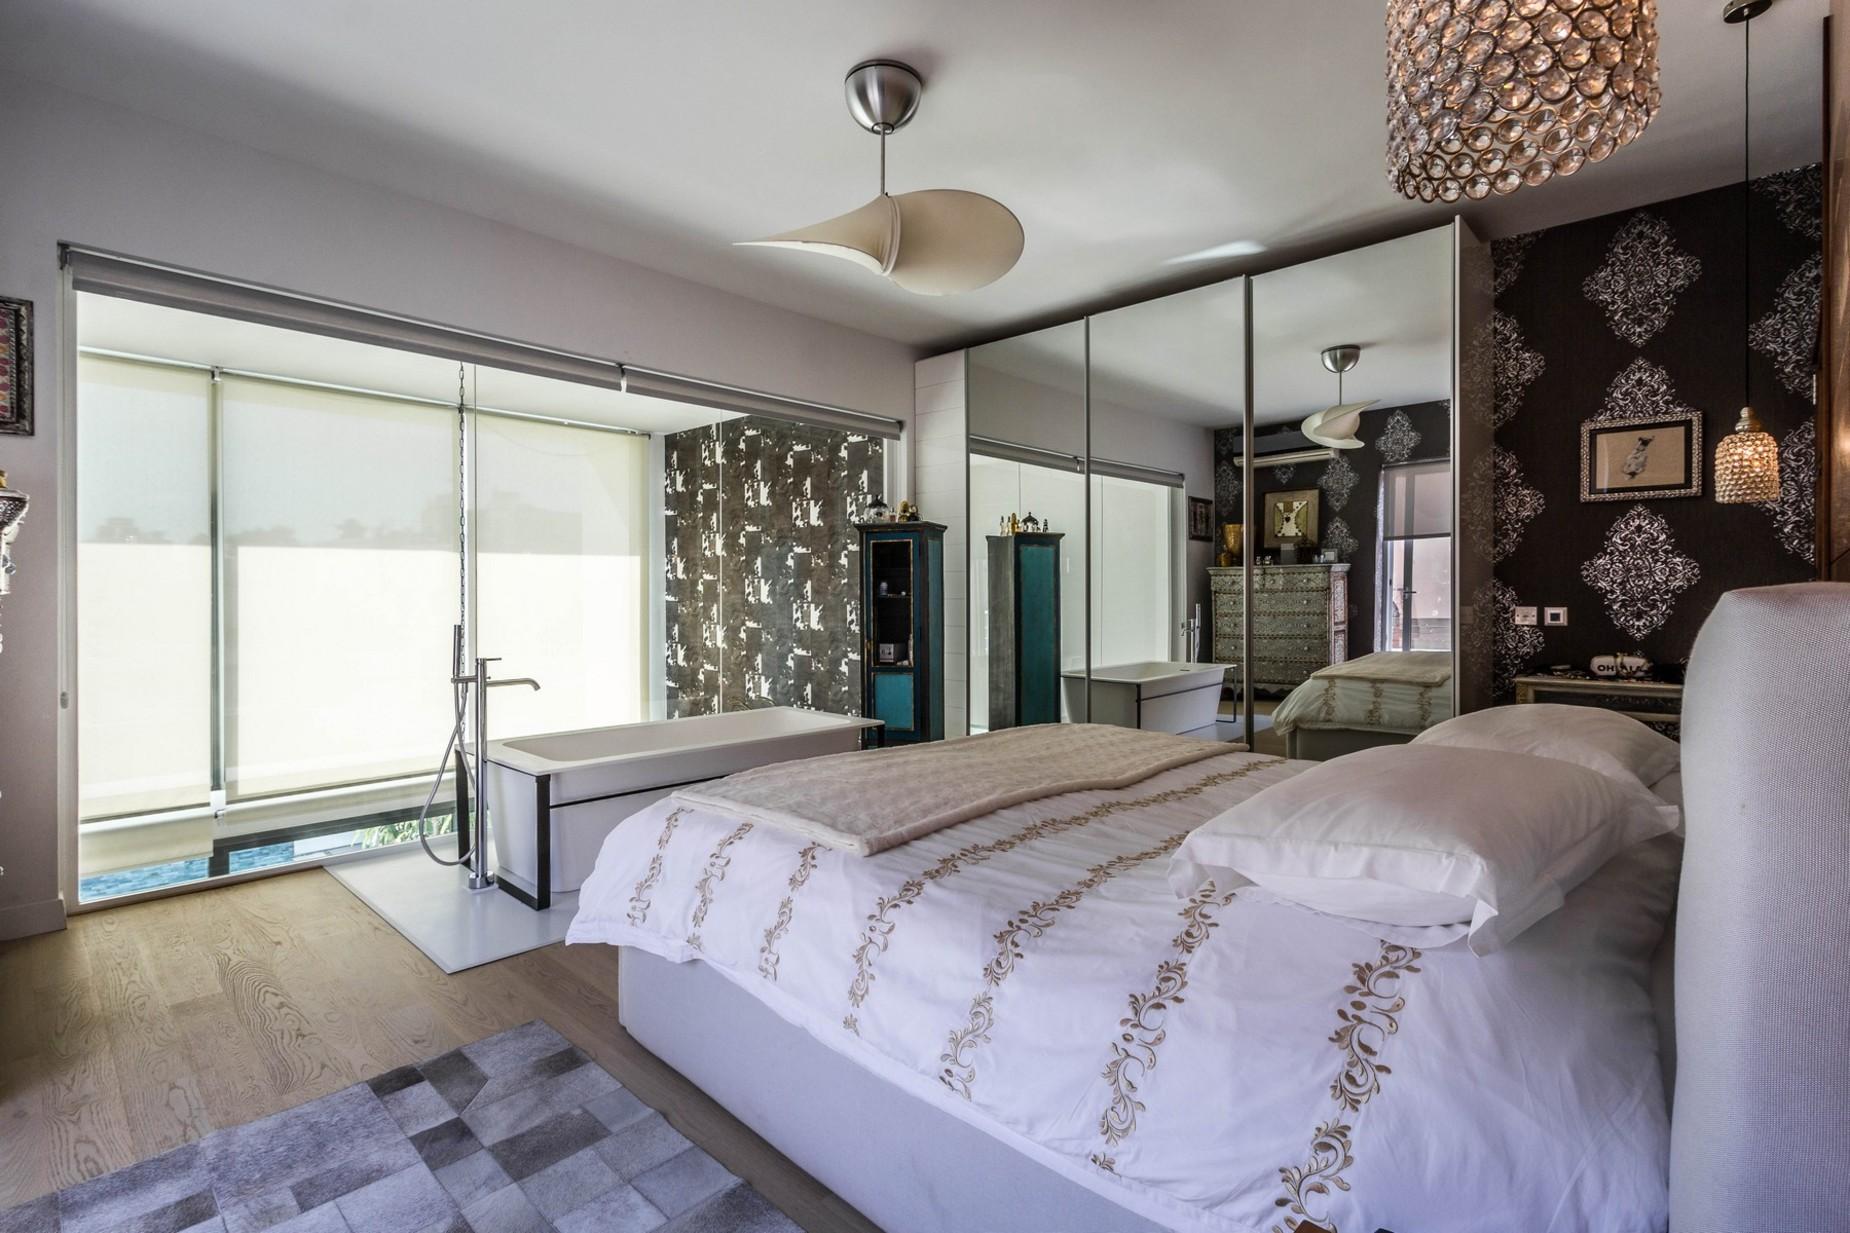 3 bed Villa For Sale in San Gwann, San Gwann - thumb 9